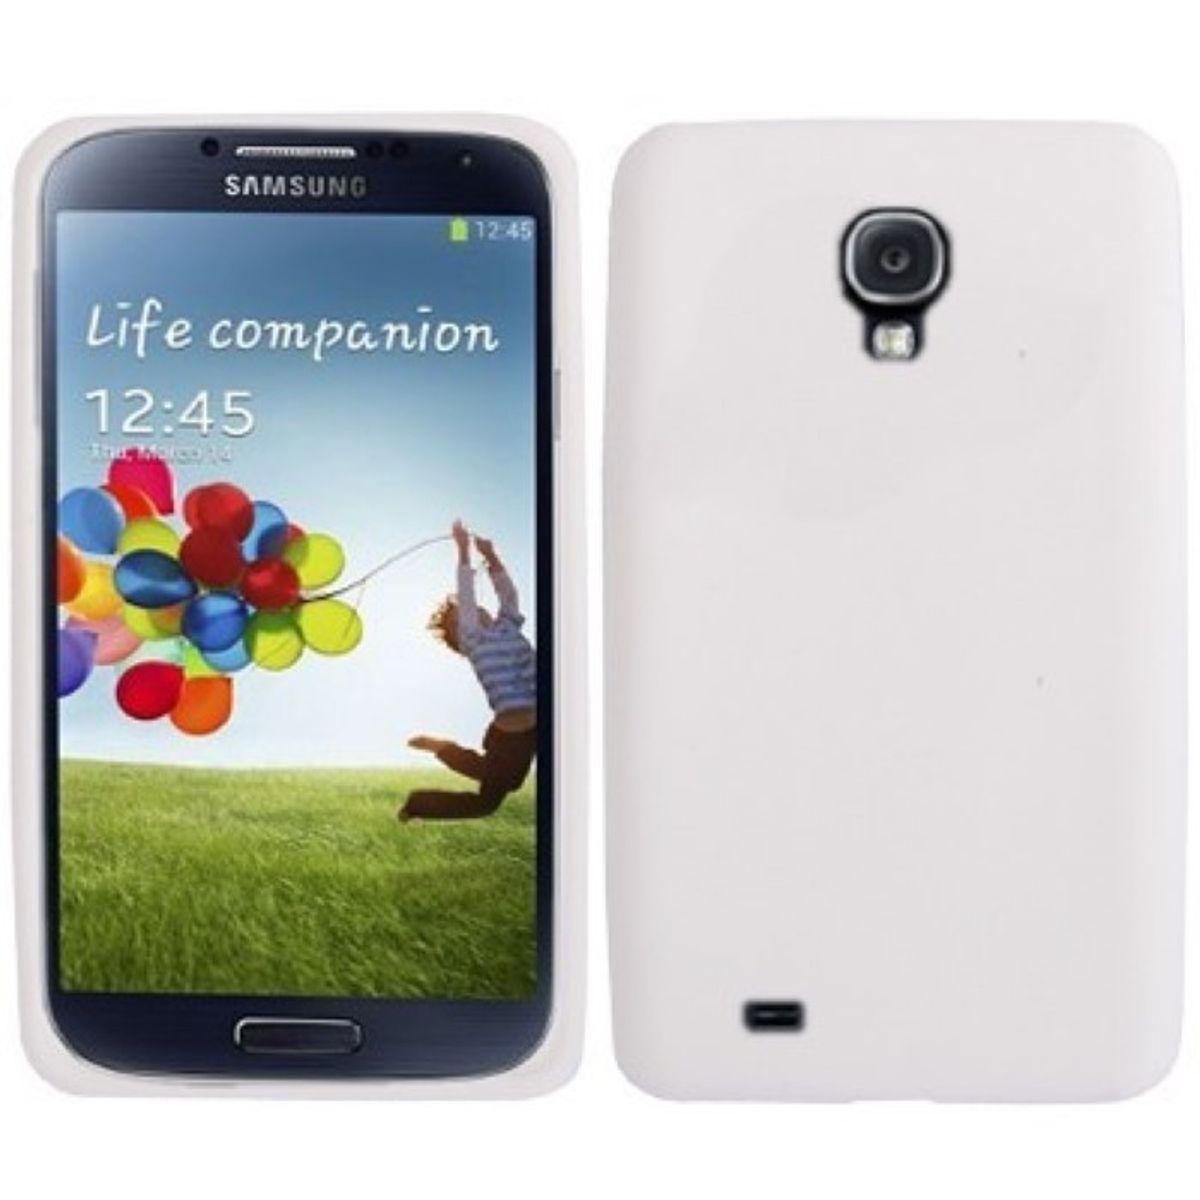 Schutzhülle Silikon Case für Handy Samsung Galaxy S4 GT-I9500 / GT-I9505 / LTE+ GT-I9506 / Value Edition GT-I9515 weiss